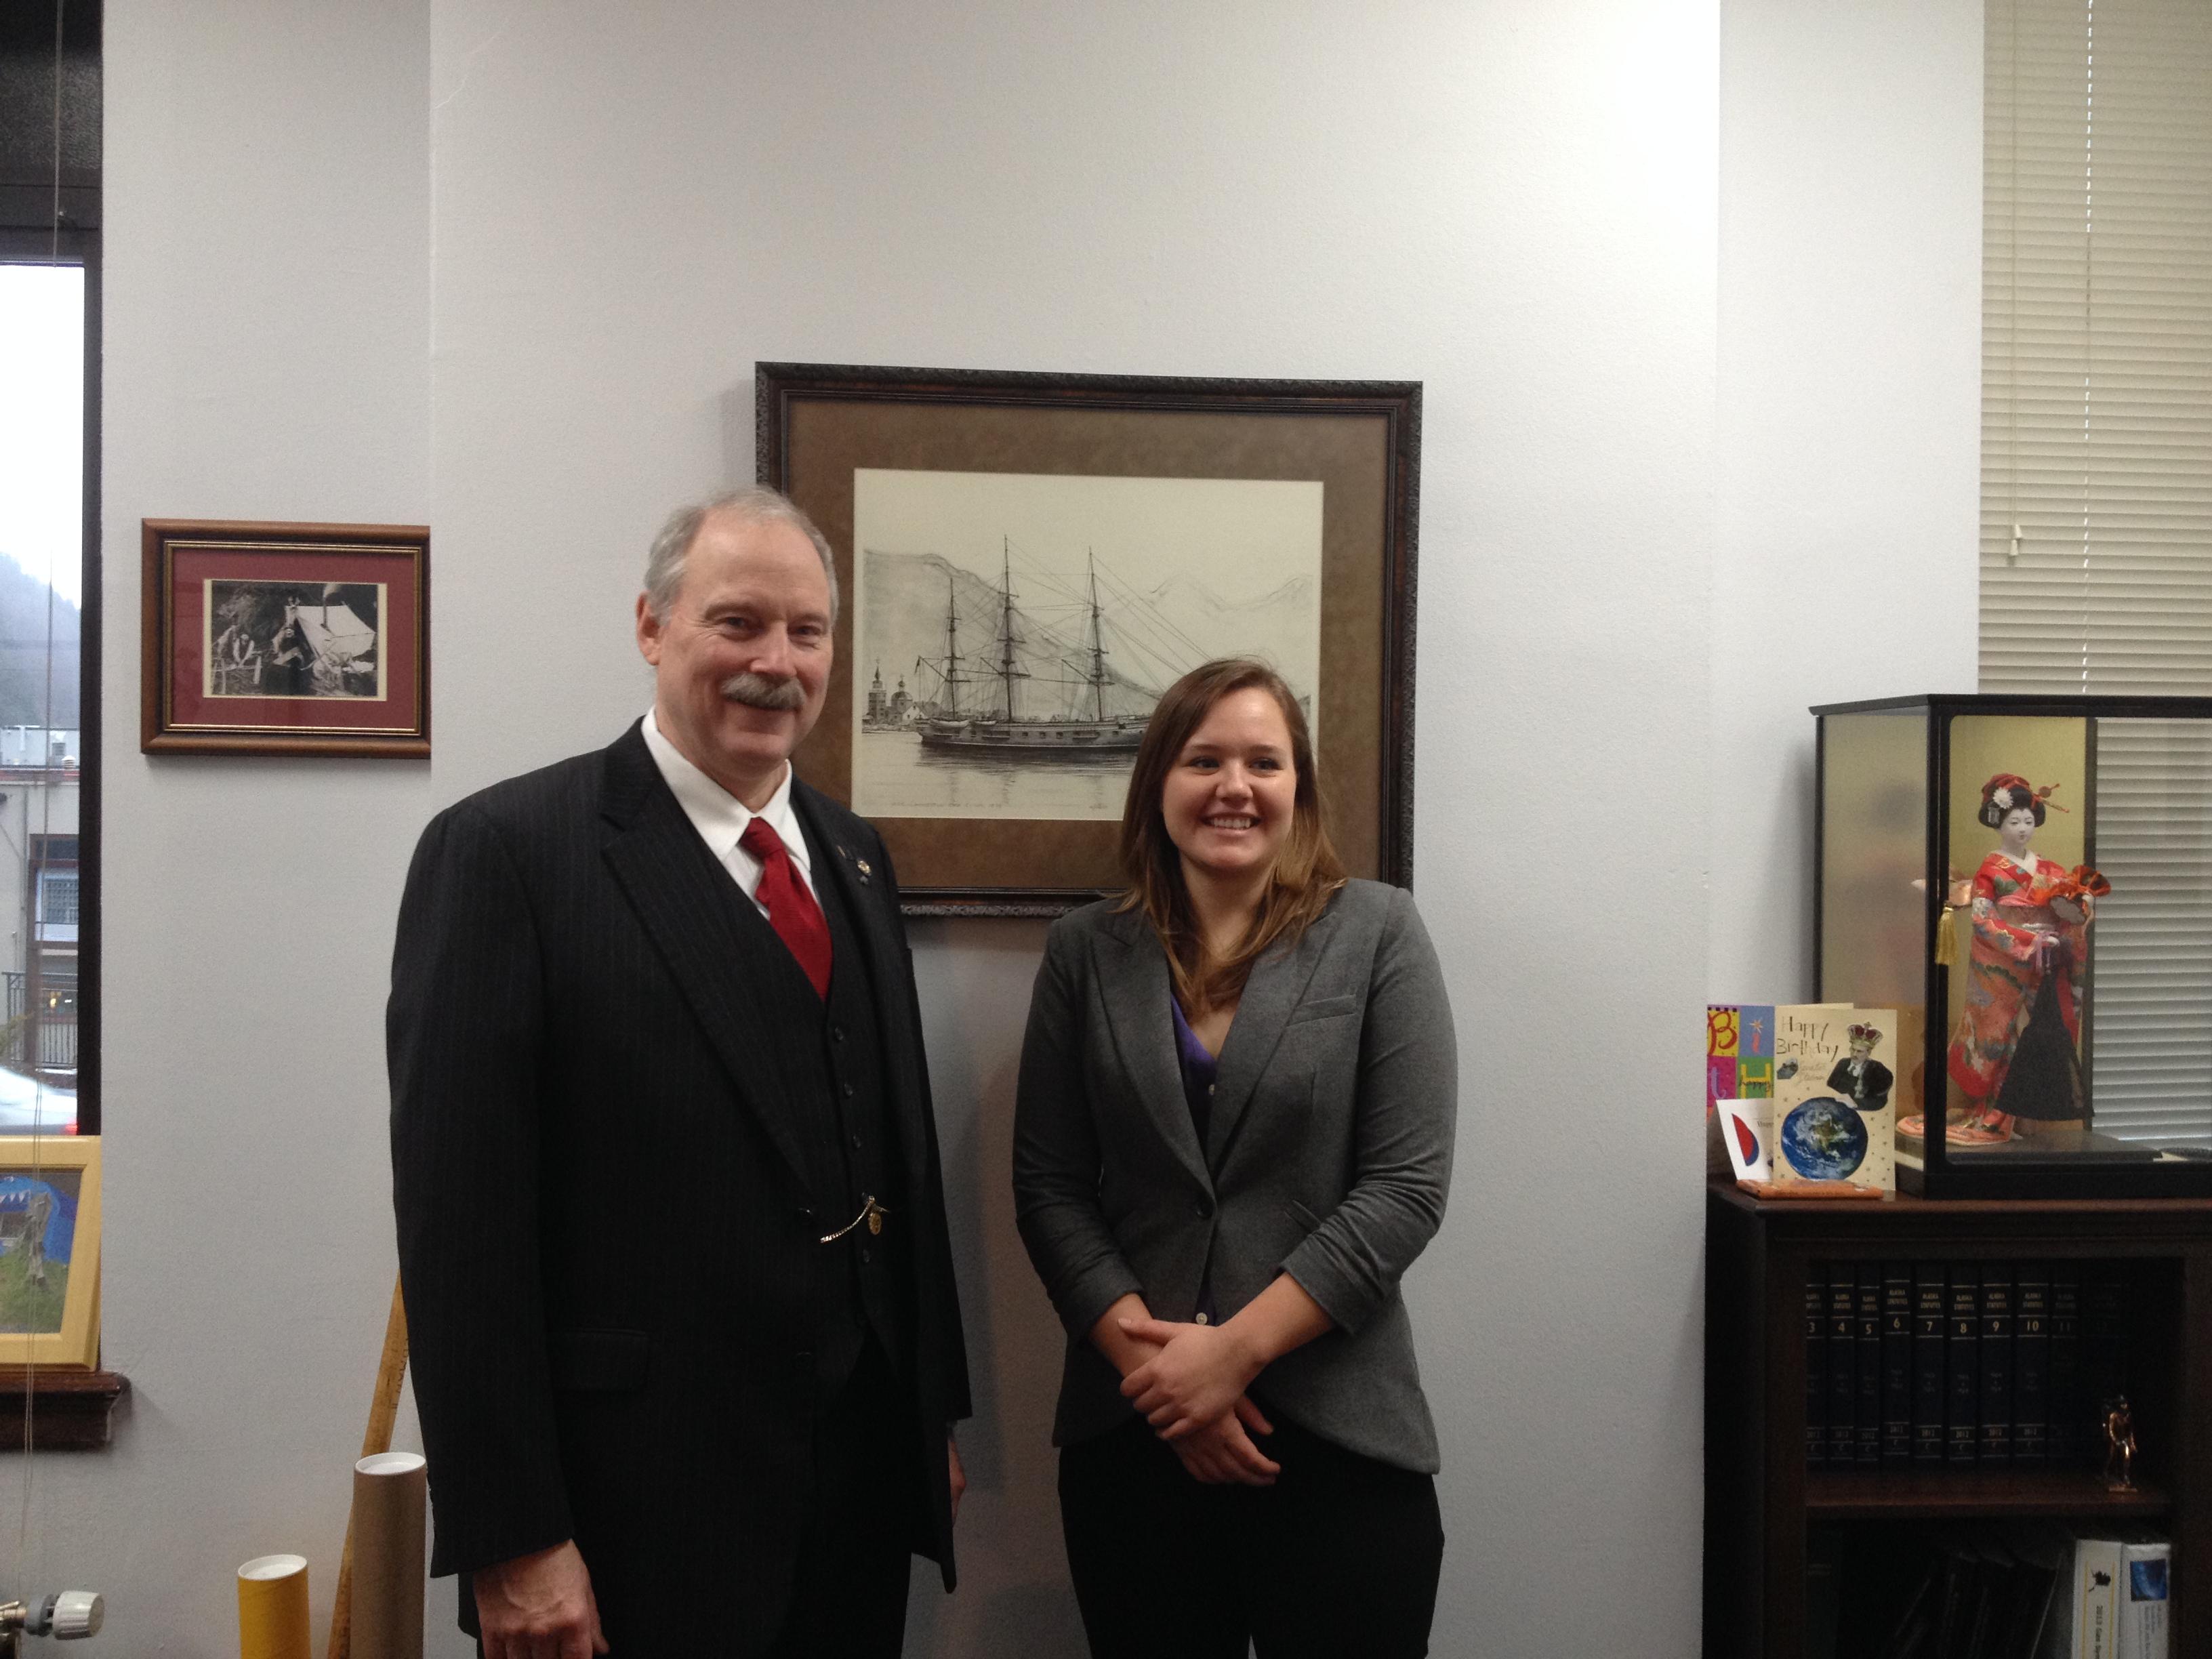 Senator Stedman with Kaleigh Holm